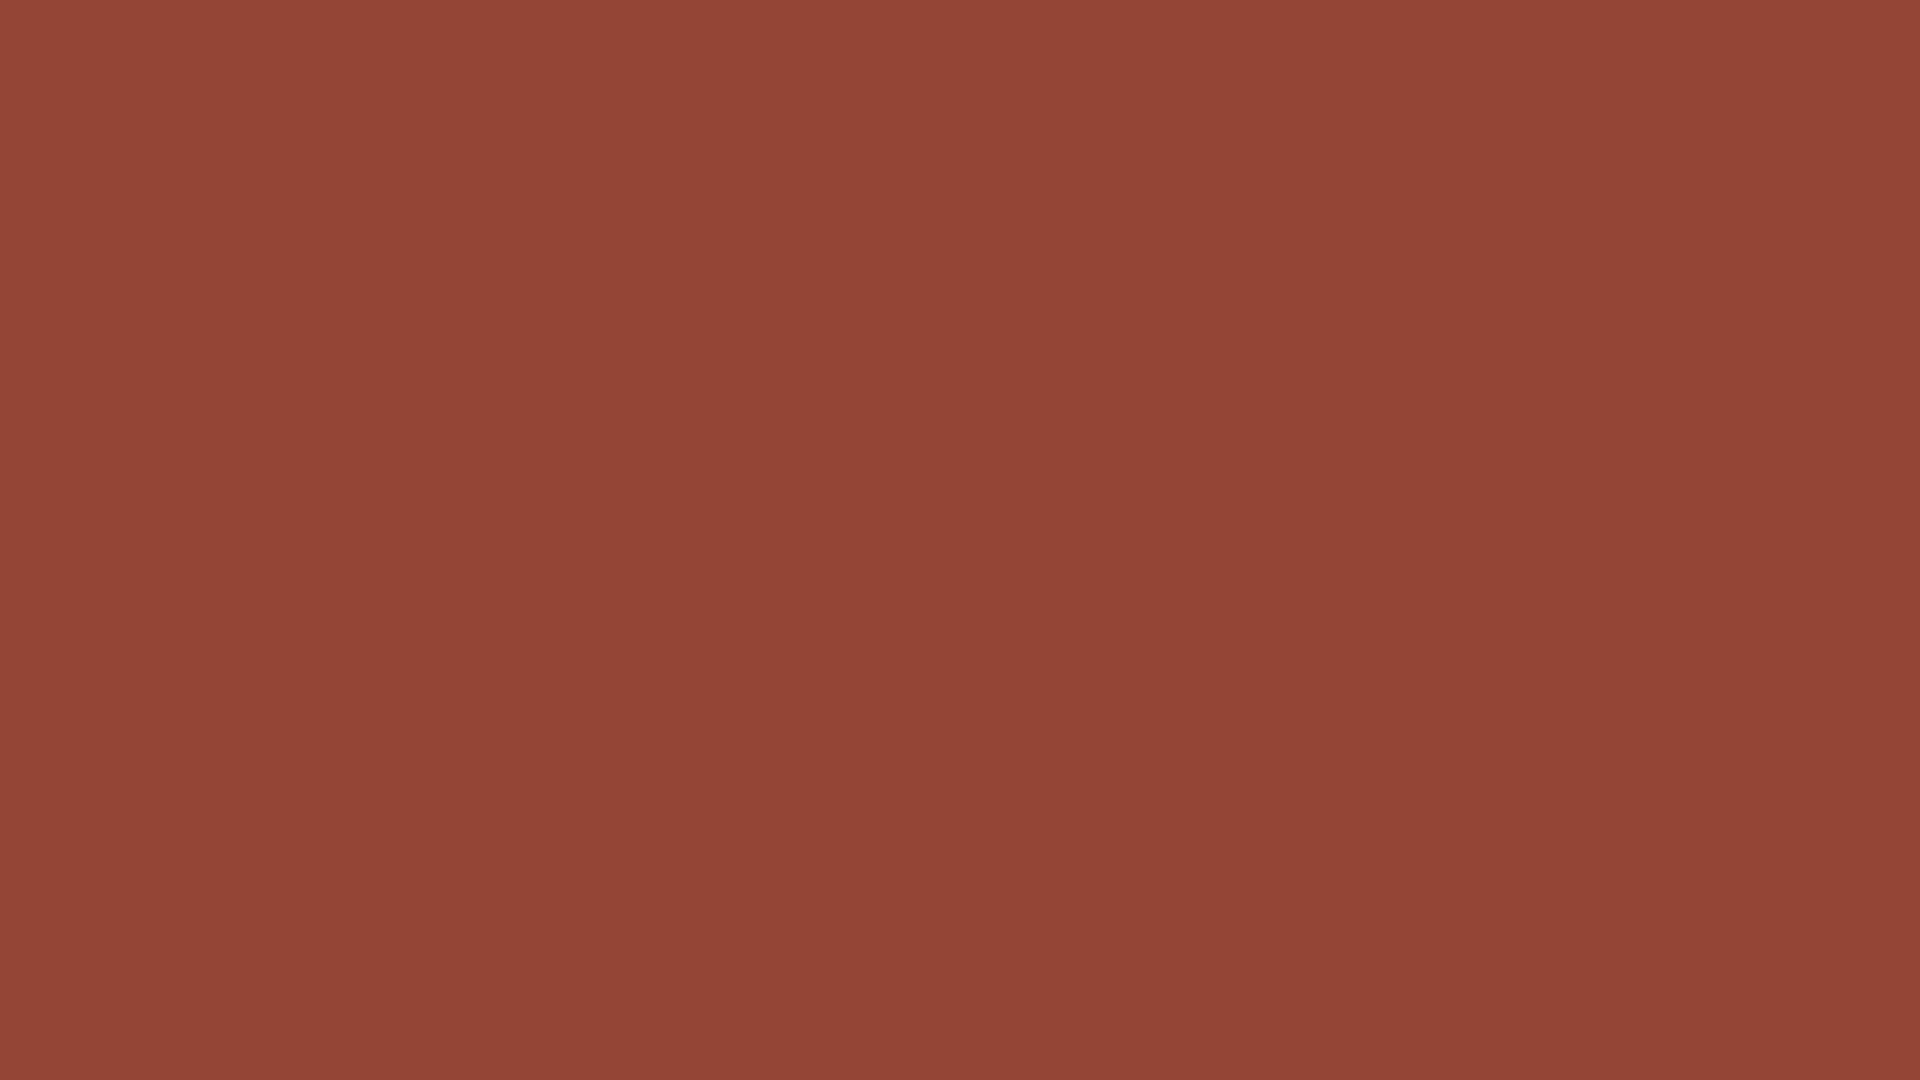 1920x1080 Chestnut Solid Color Background